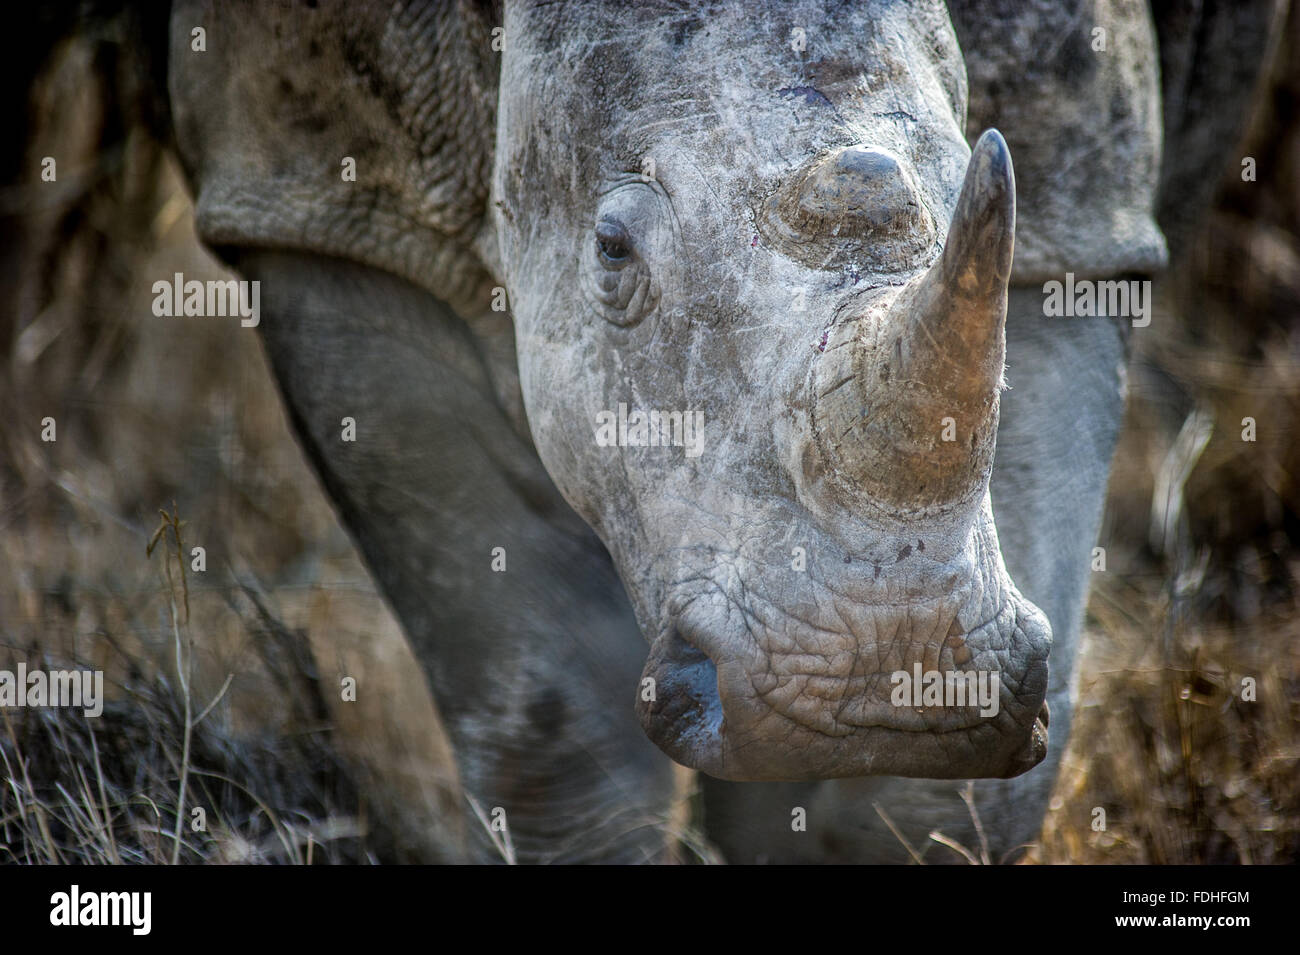 Rhinoceros (Rhinocerotidae) at Hlane Royal Game Preserve, Swaziland, Africa. - Stock Image